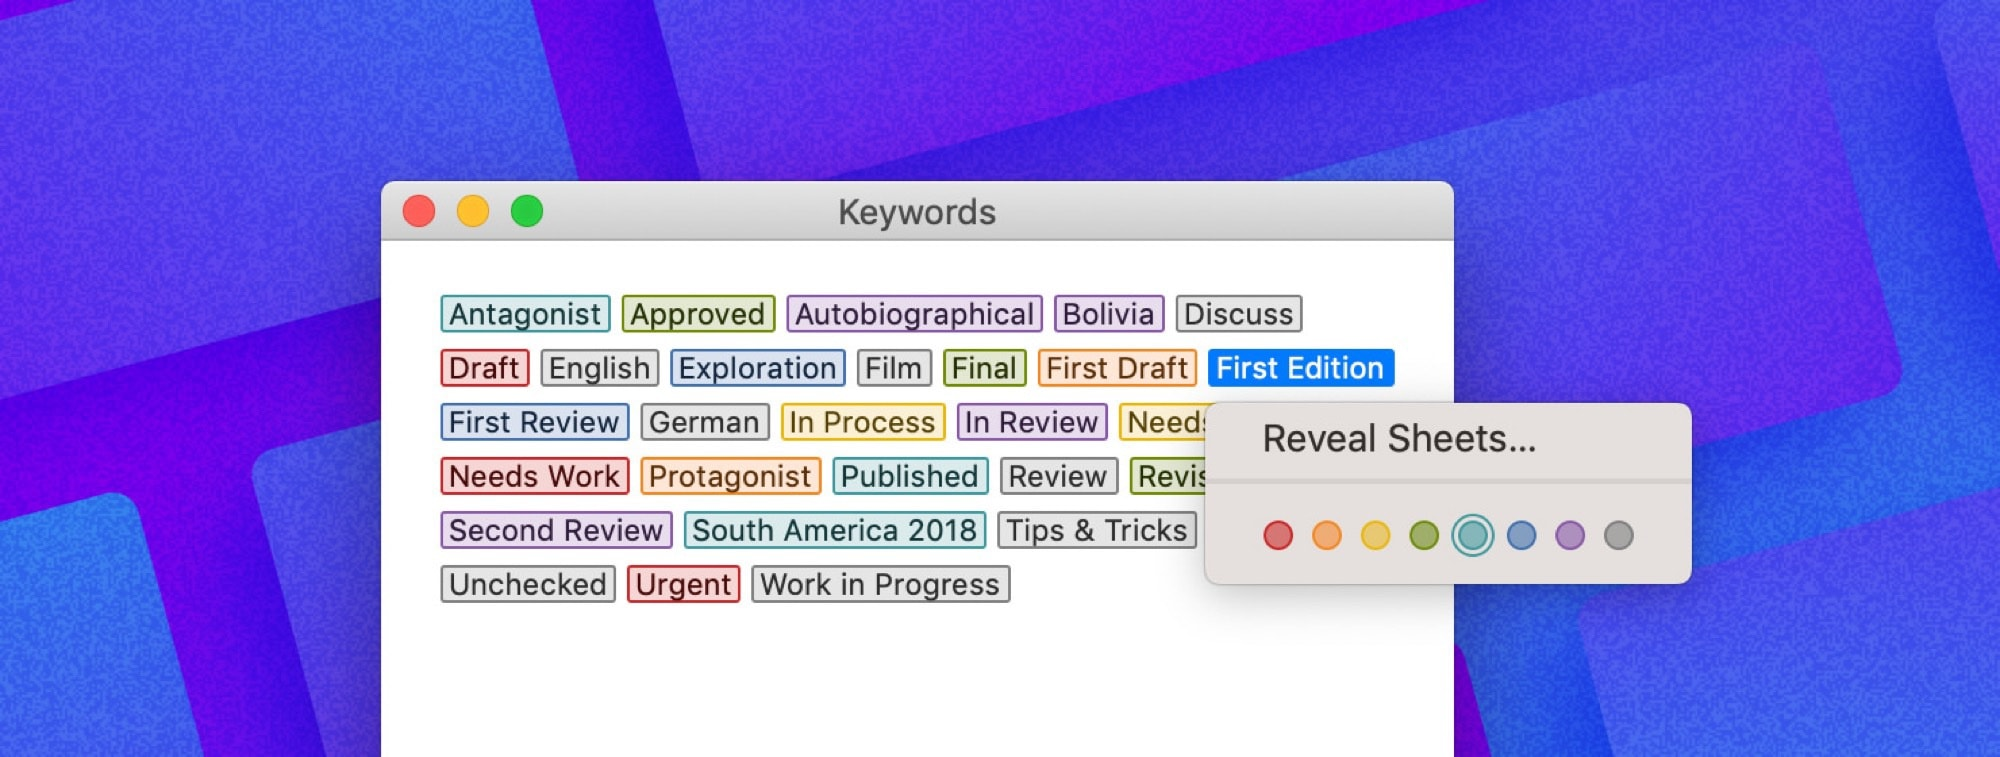 Ulysses adds editable keywords!